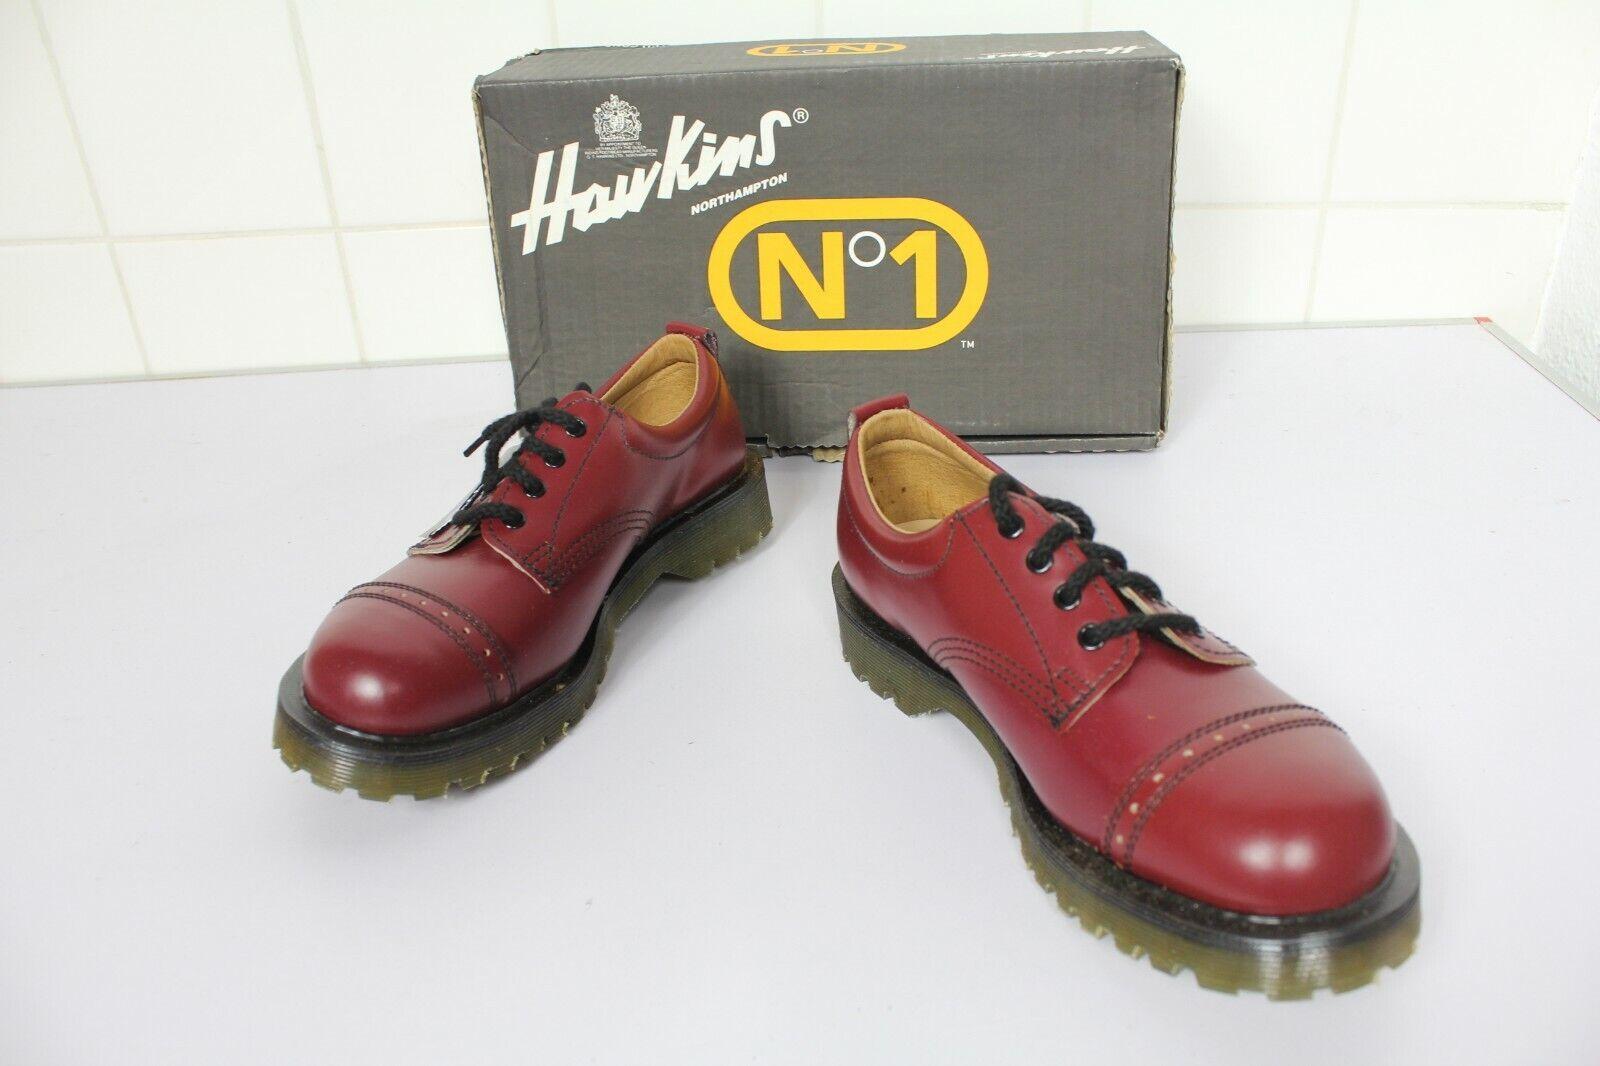 Vintage Dr.Martens Hawkins Schuhe Echtleder Weinrot Eu 39-Uk 6 made in England